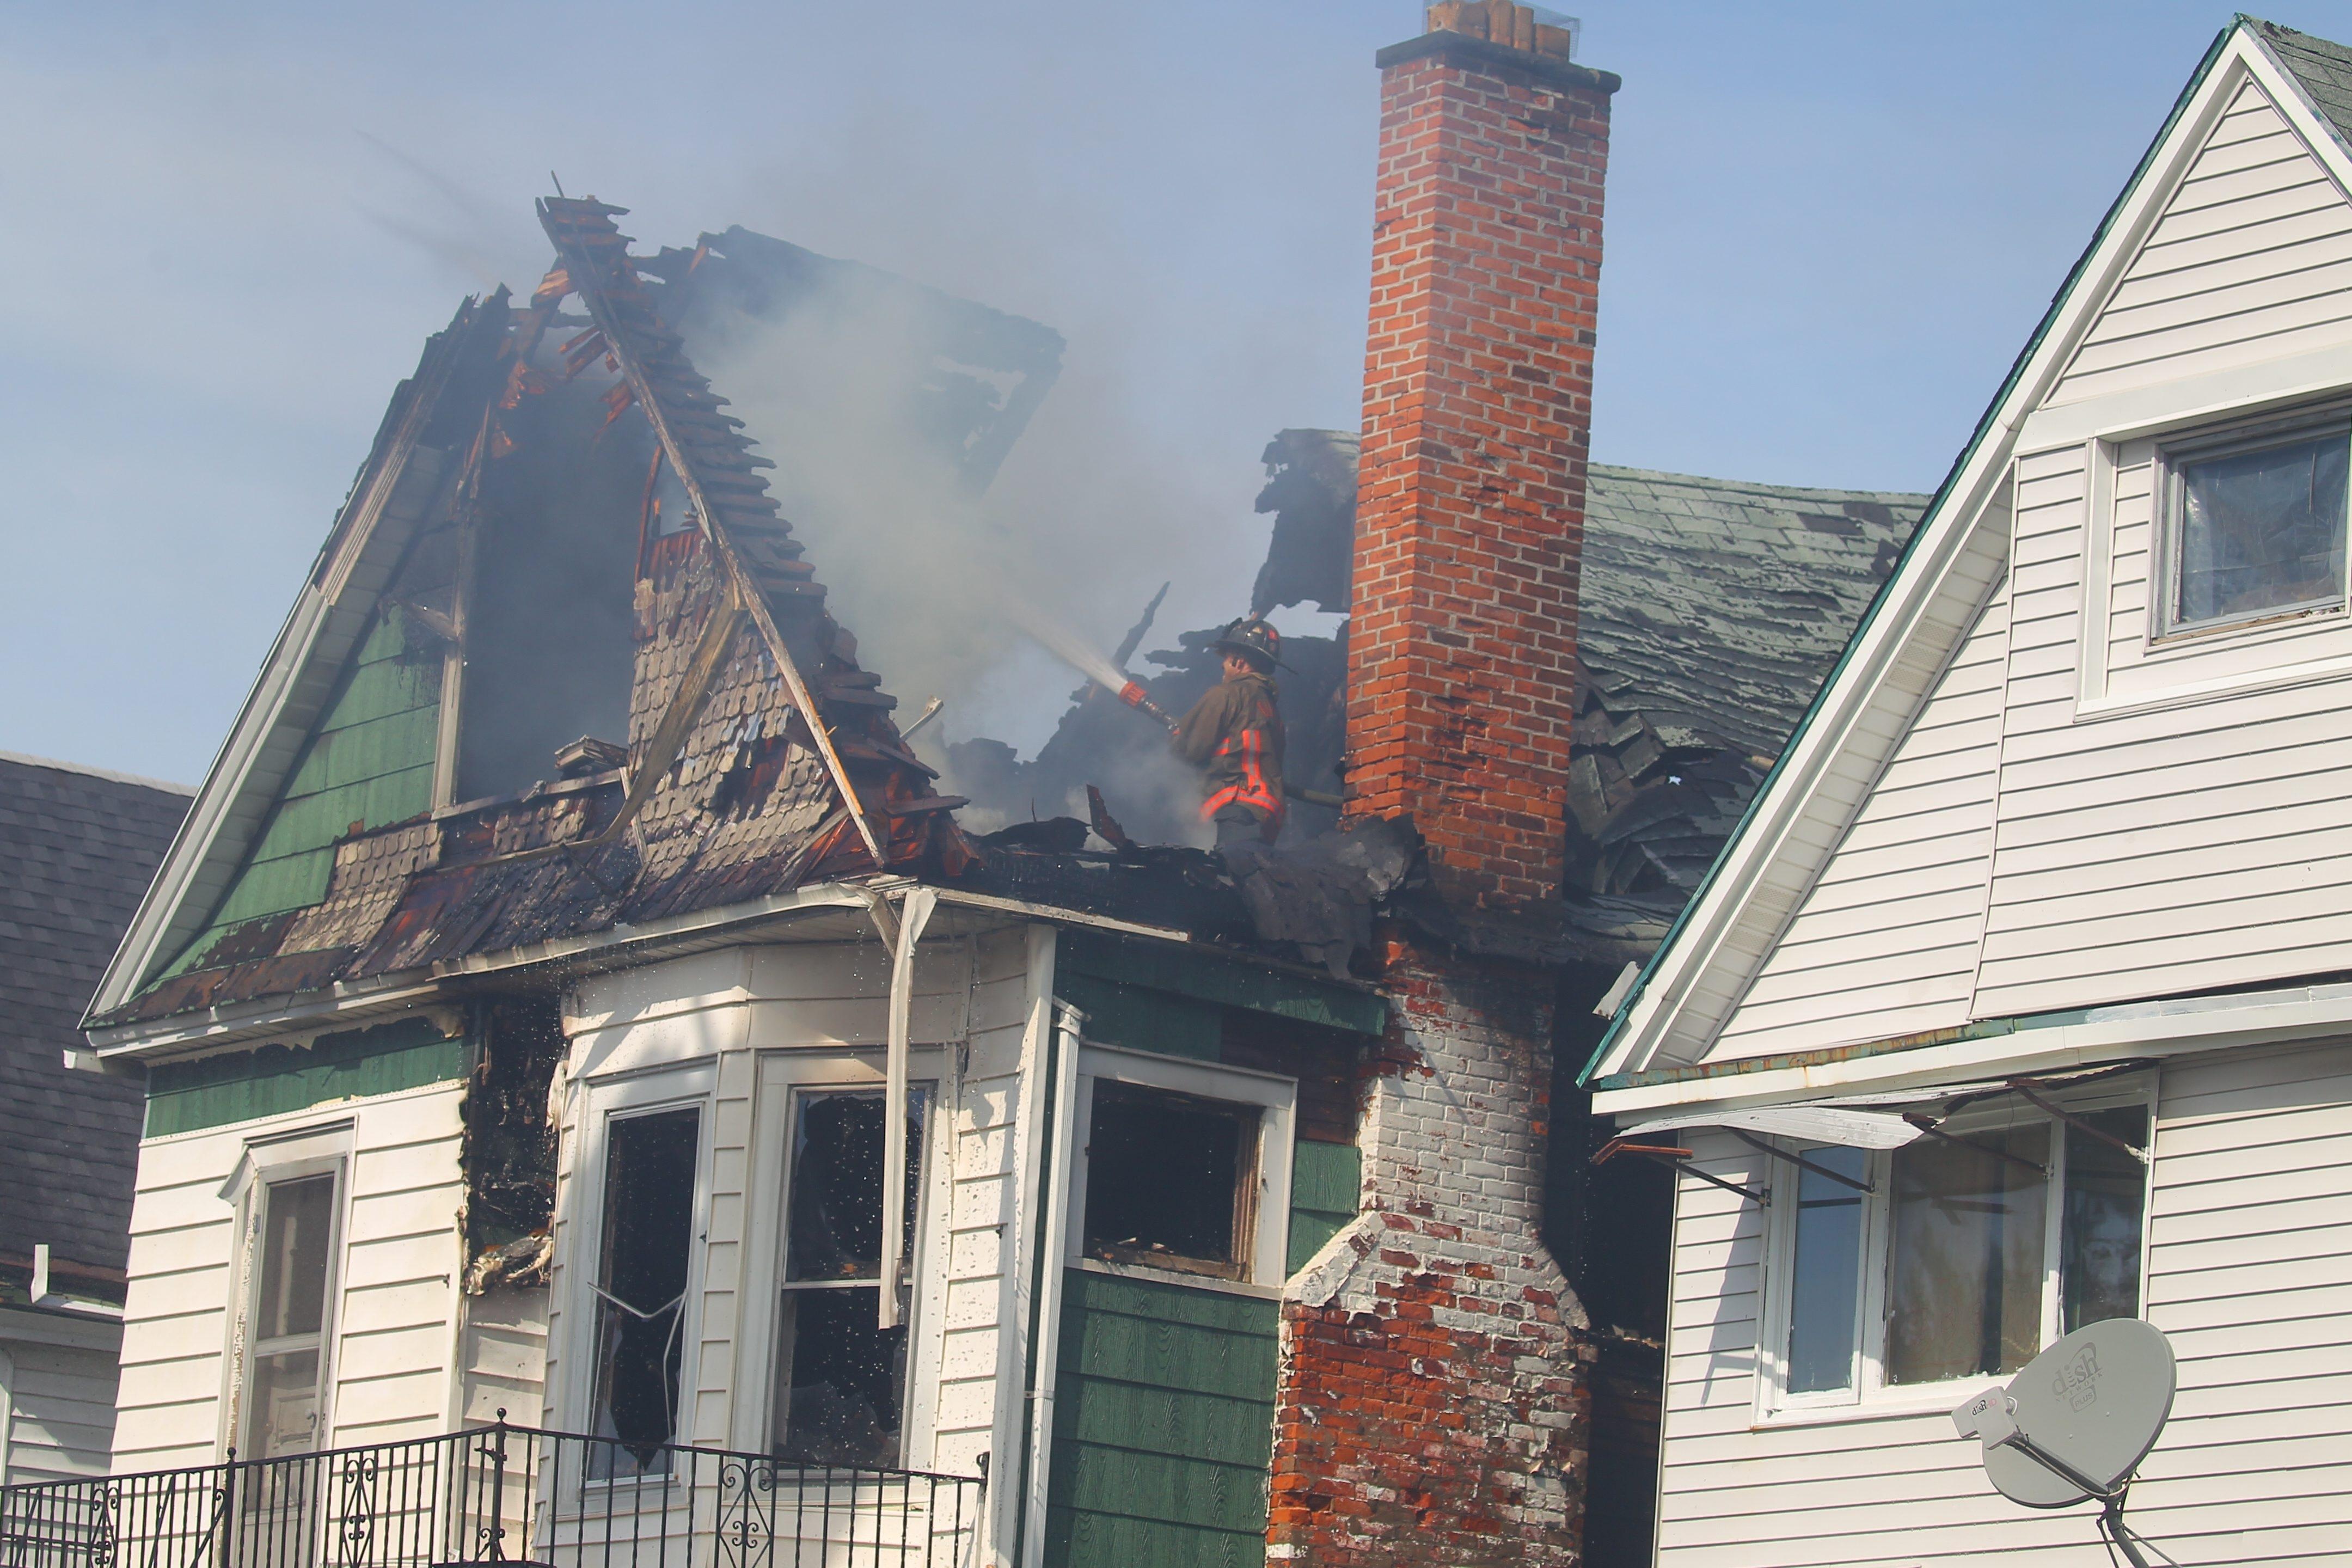 A house fire at 431 14th St. in Buffalo on Sept. 20. (John Hickey/Buffalo News)